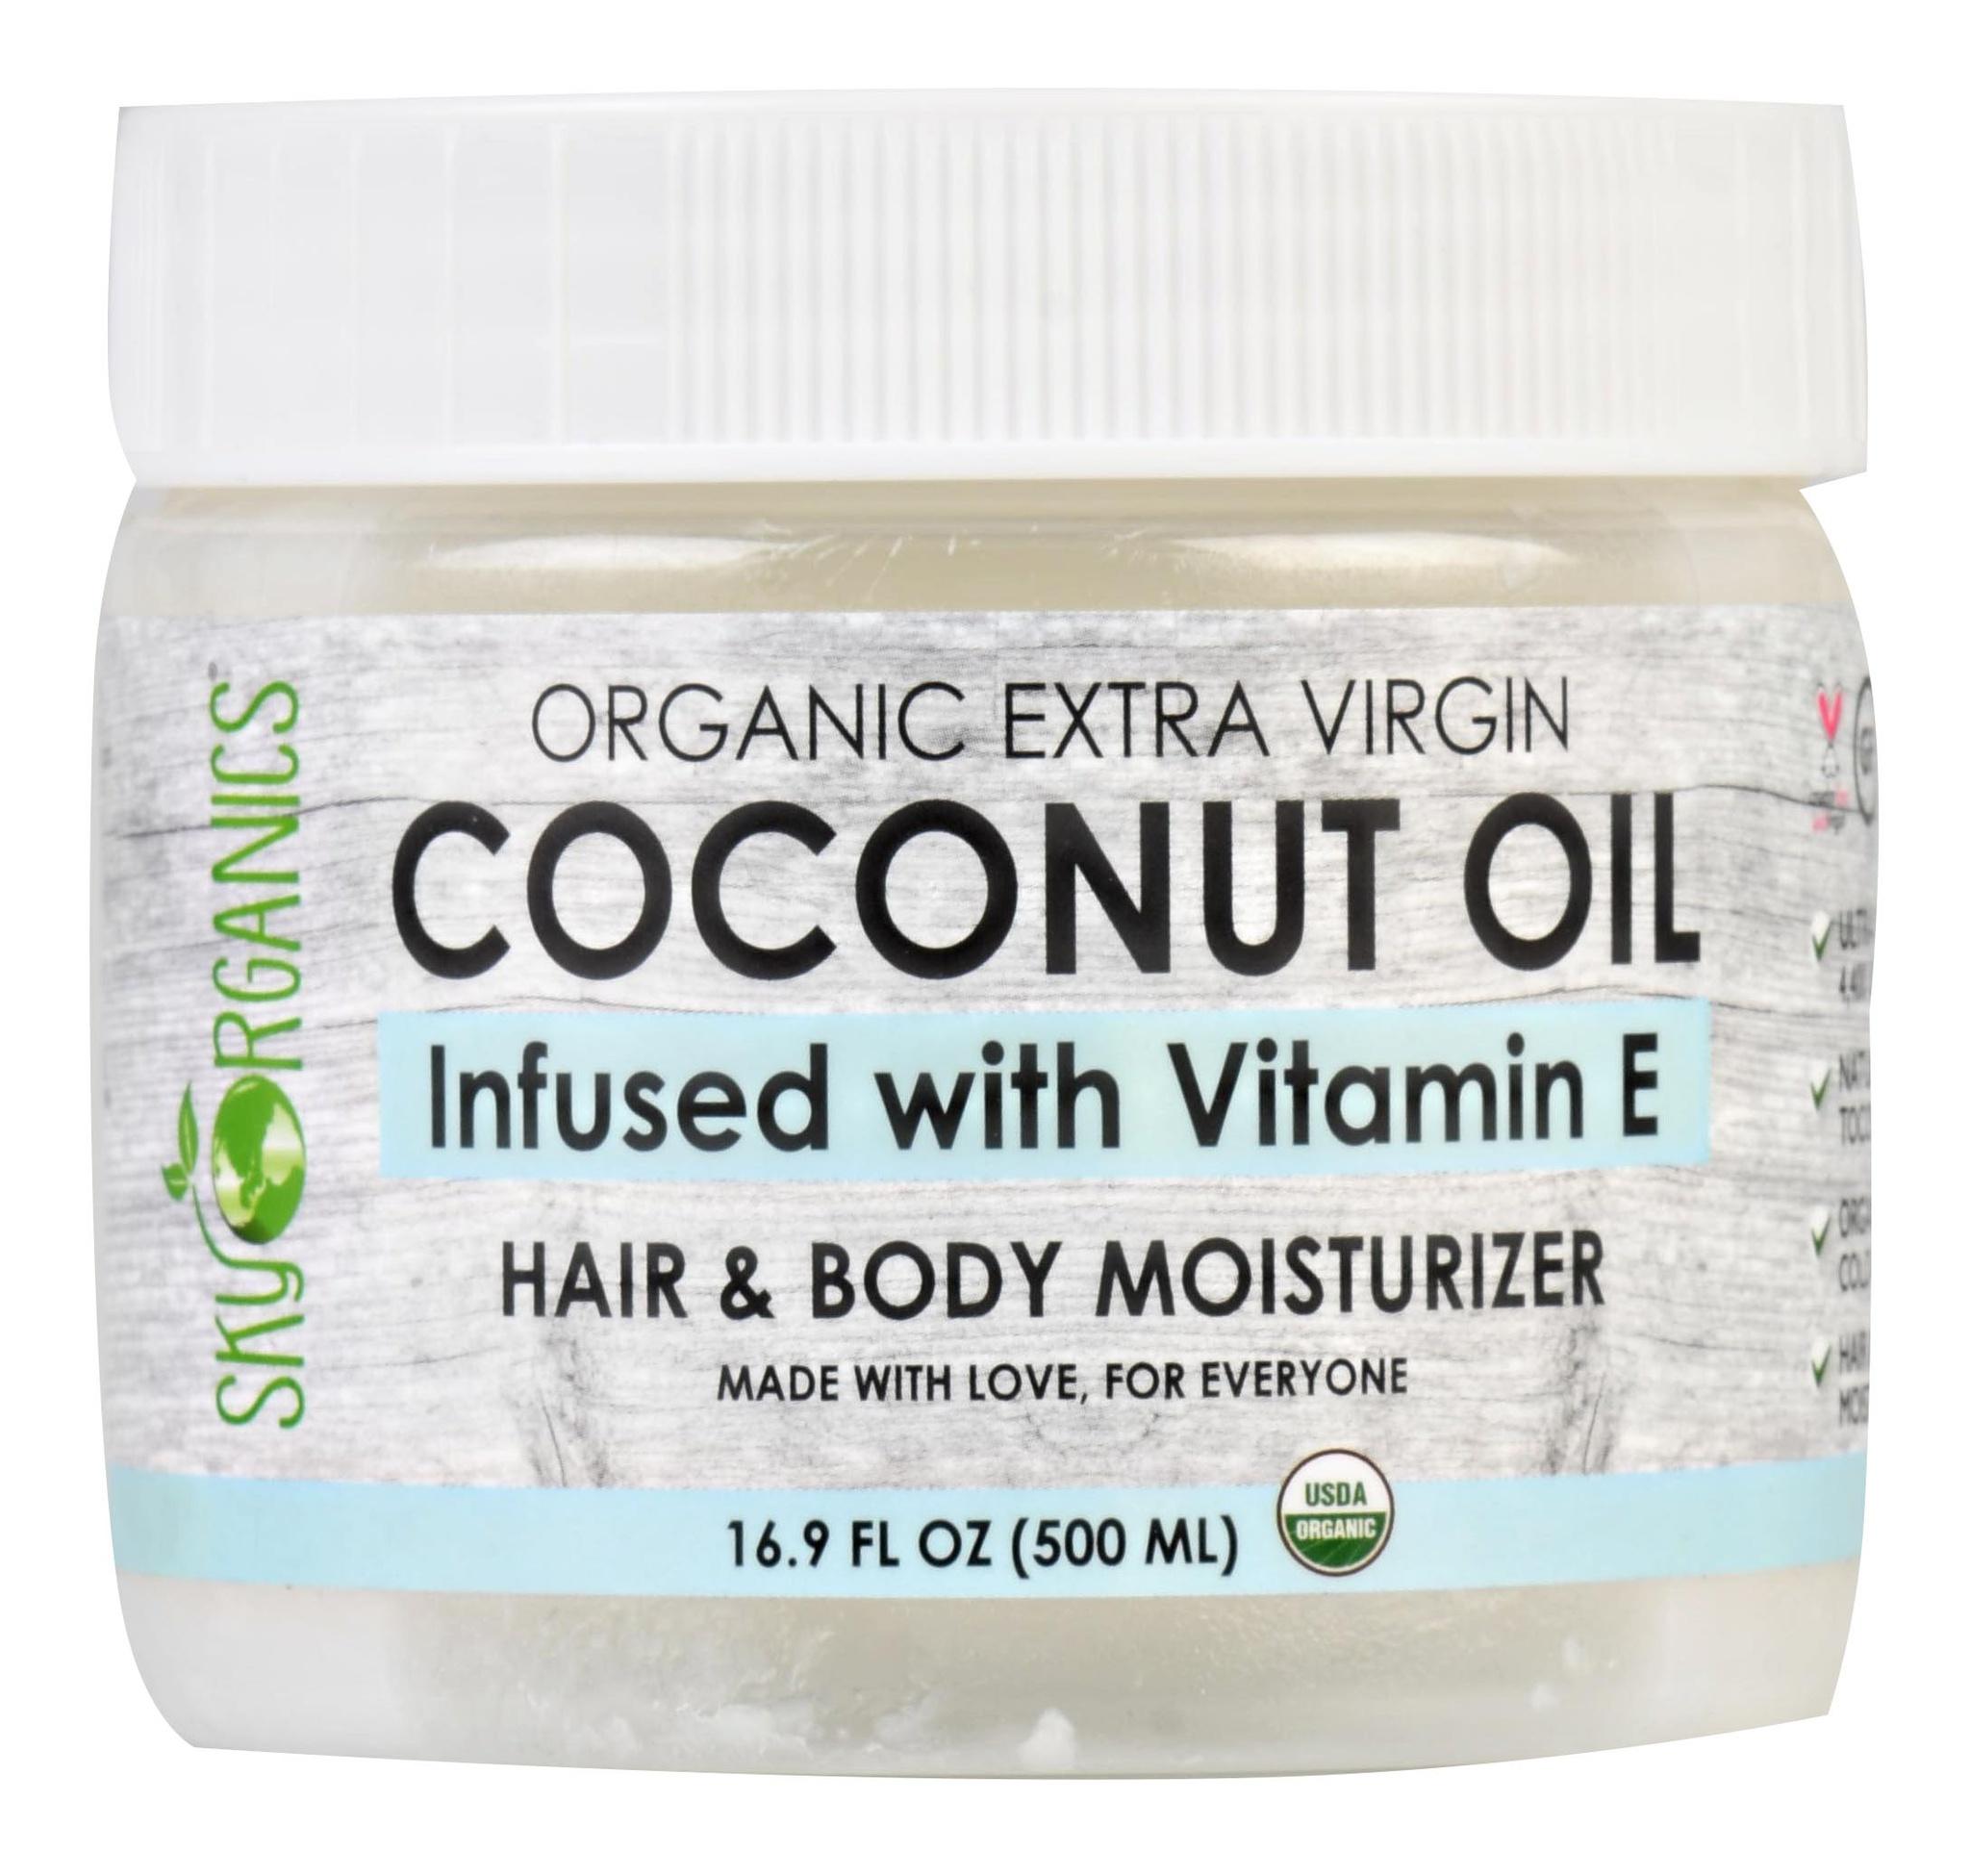 Sky Organics Organic Extra Virgin Coconut Oil